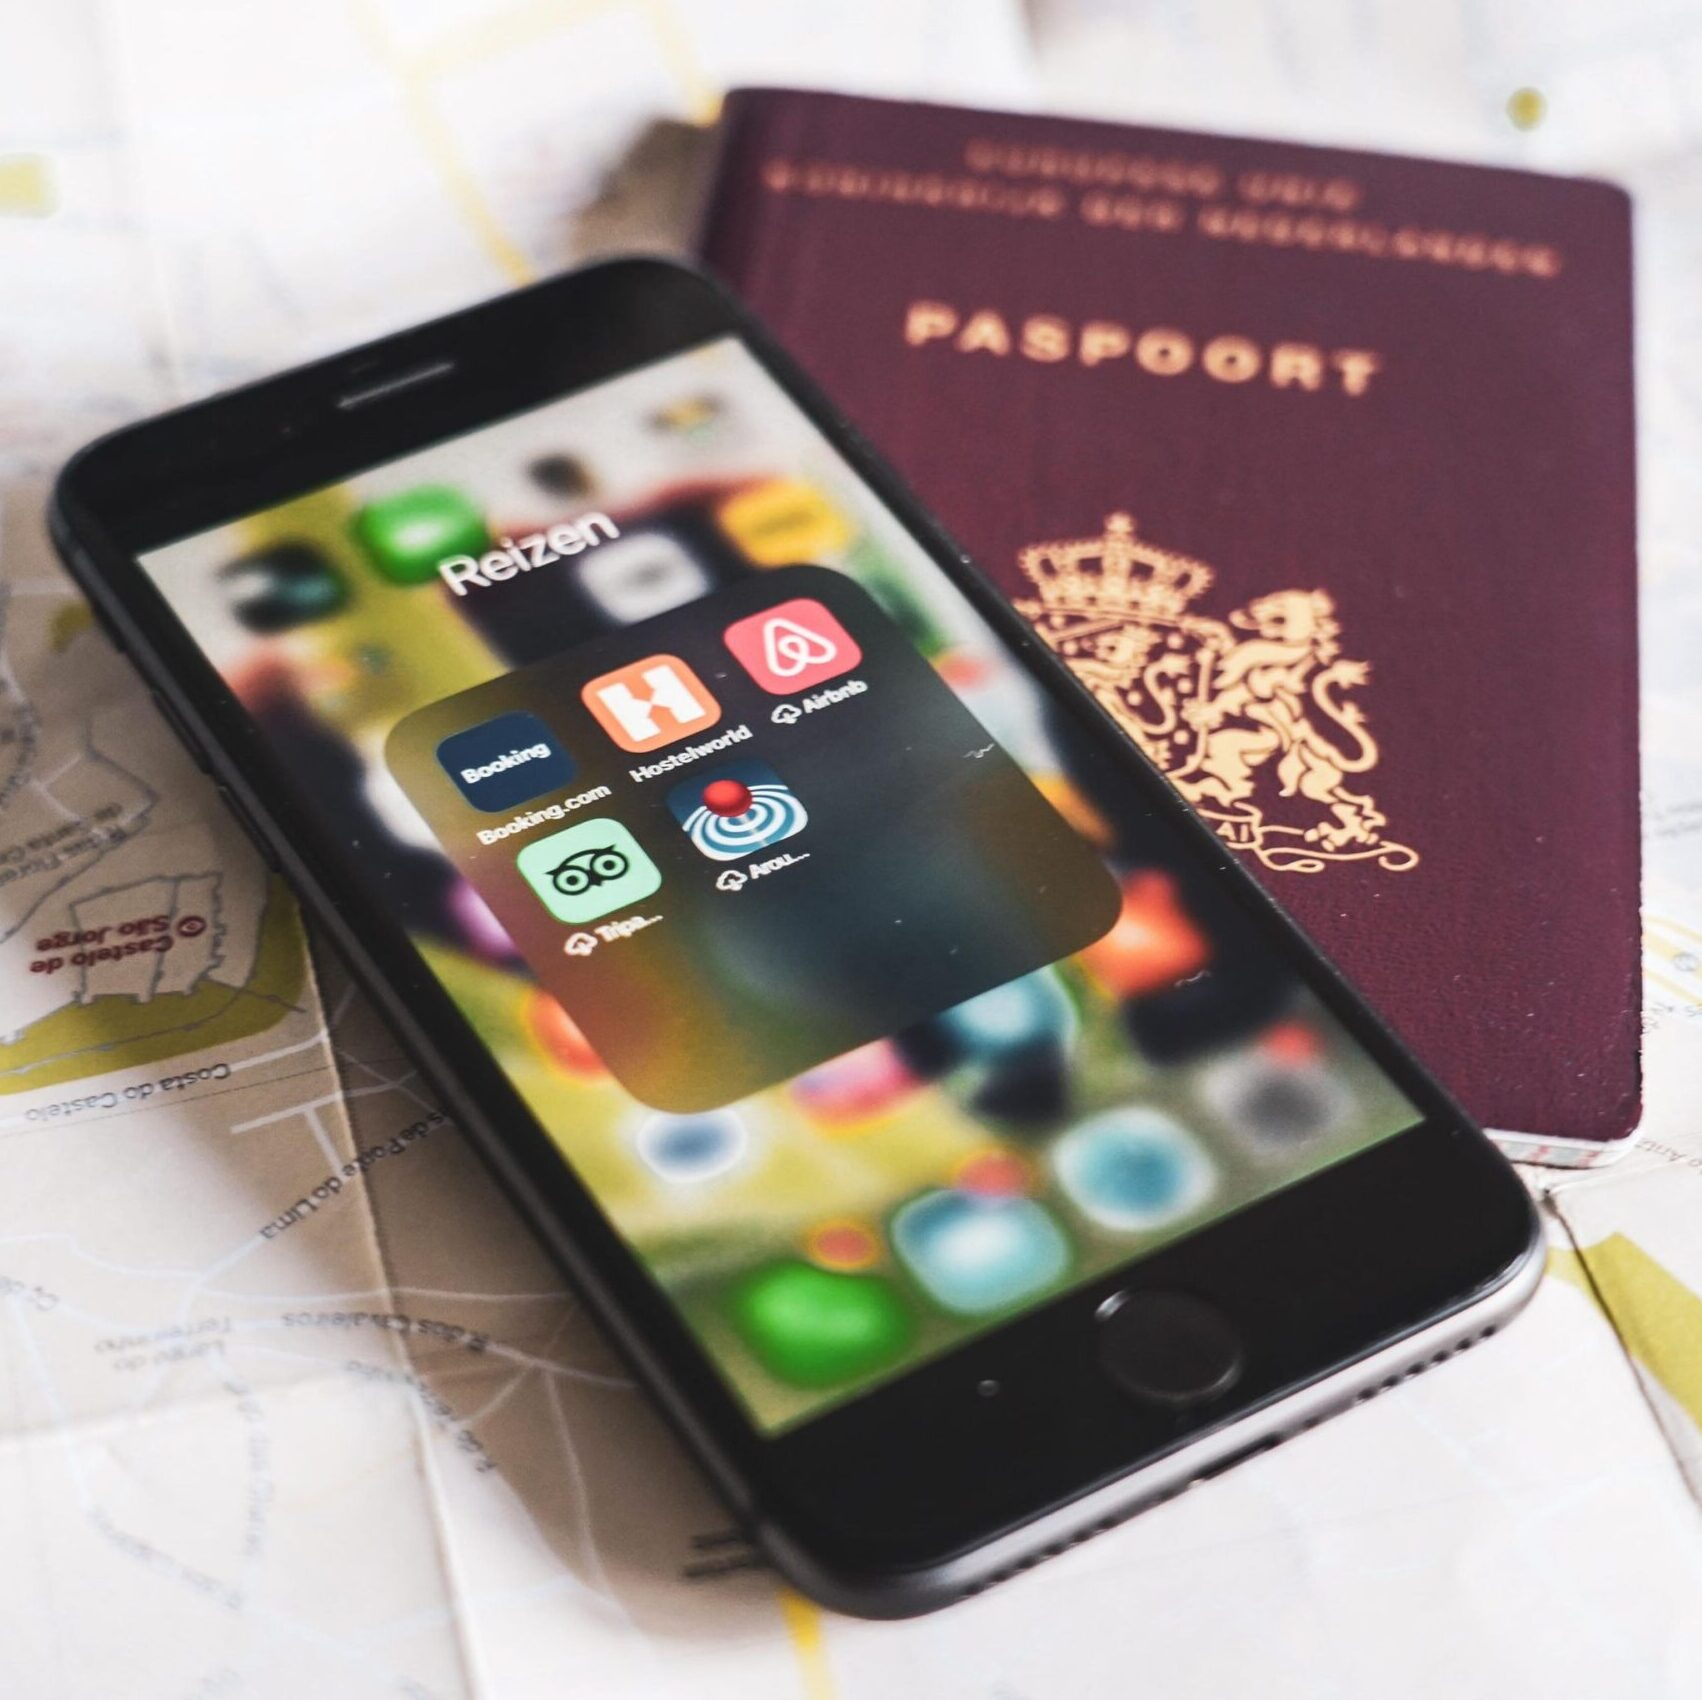 mobiele apps voor mee op reis - travelnote